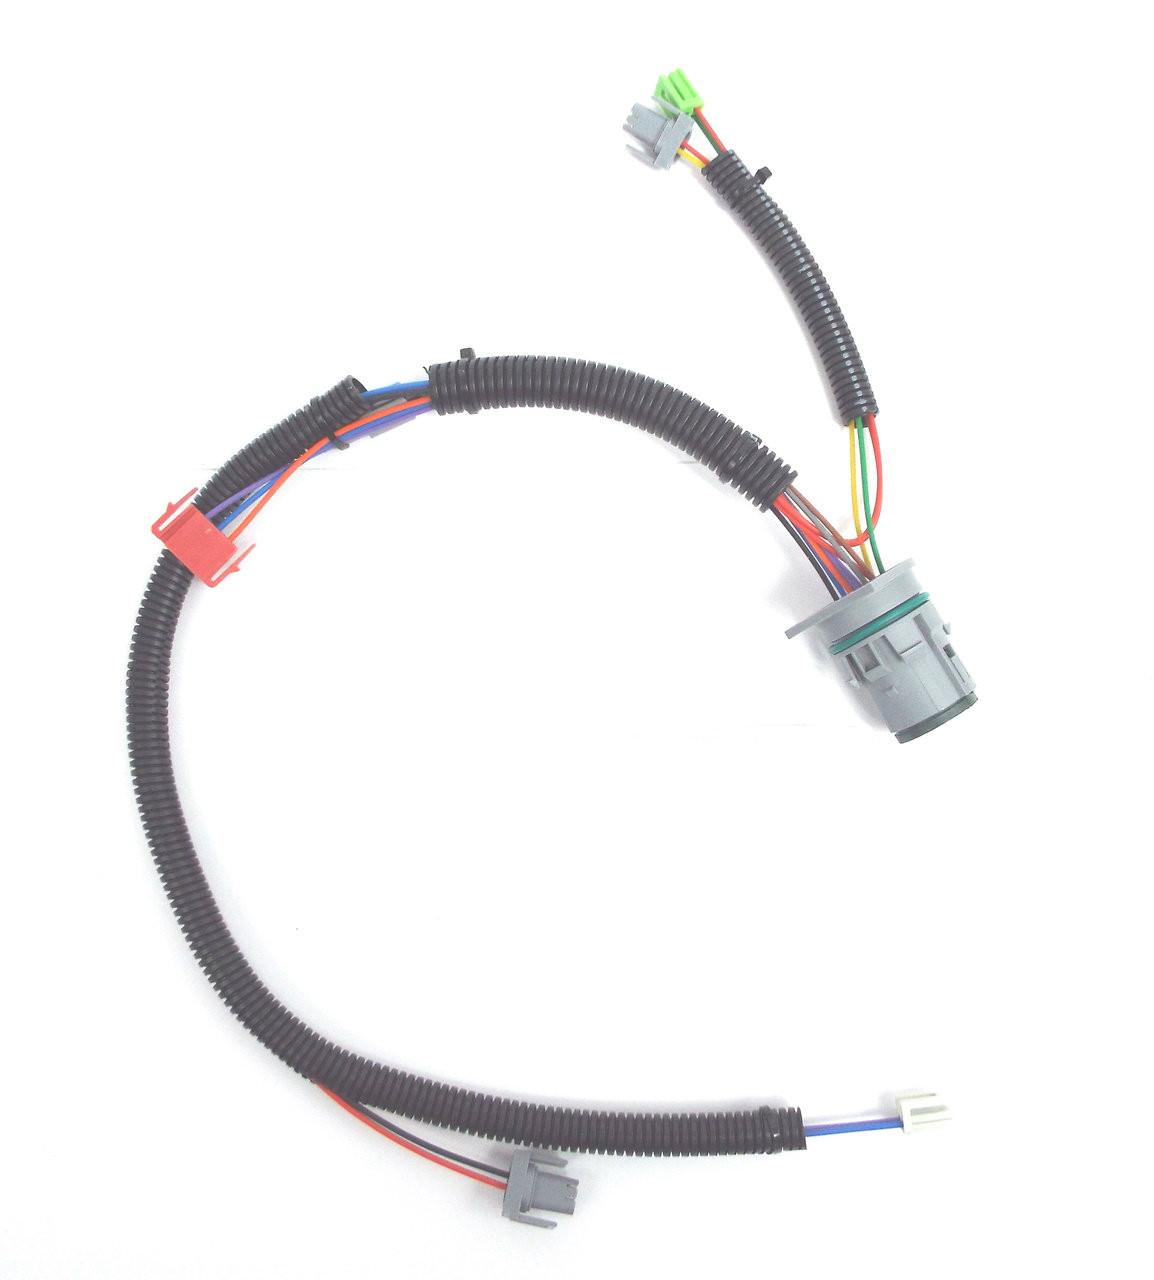 4l80e wiring harness 4l80e internal wiring harness  2004 up  24200161 global 4l80e wiring harness failure 4l80e internal wiring harness  2004 up